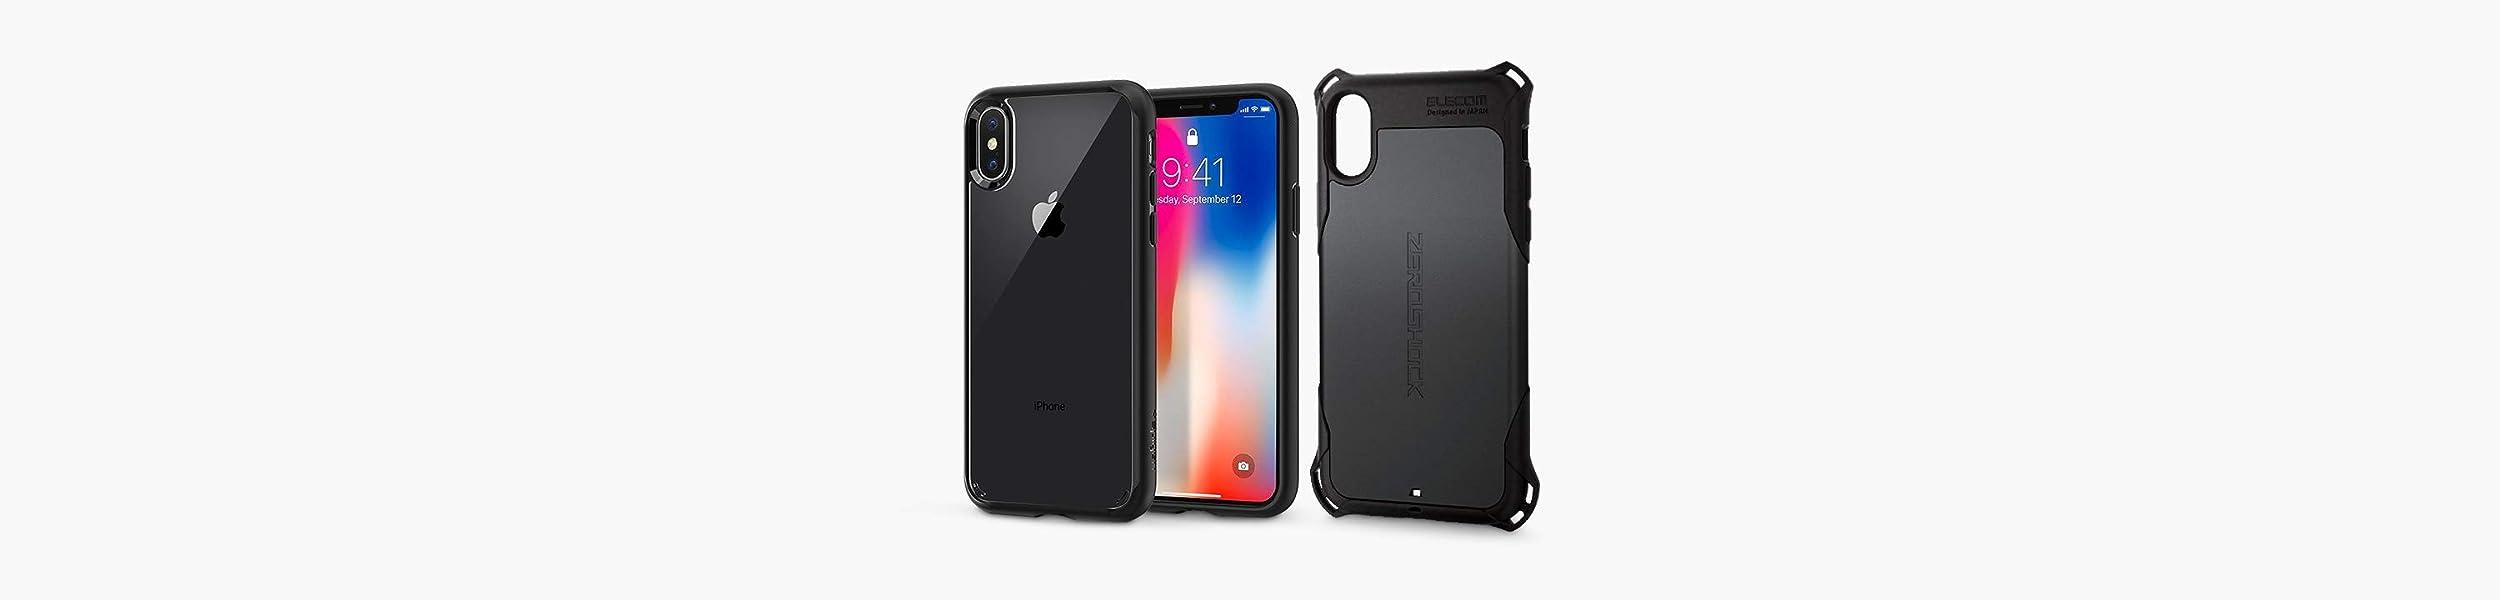 iPhone関連用品ストア 新型iPhone対応アクセサリなど